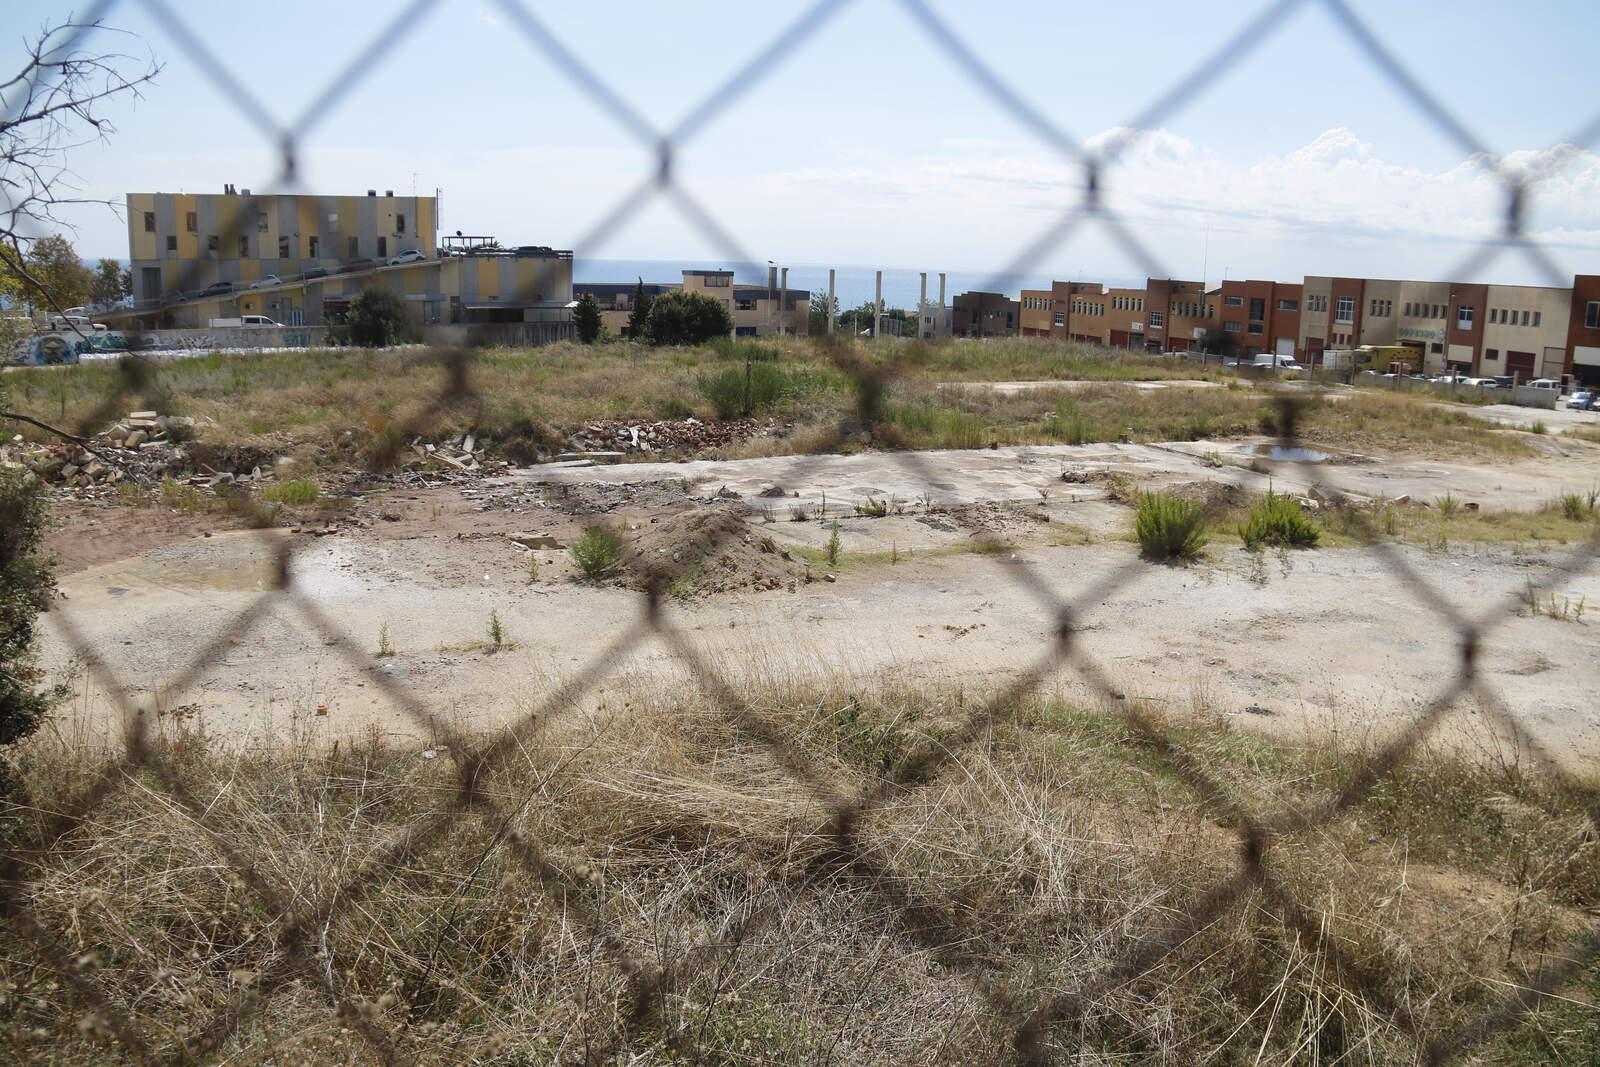 El solar on s'ha de construir el parc d'economia circular de Mataró